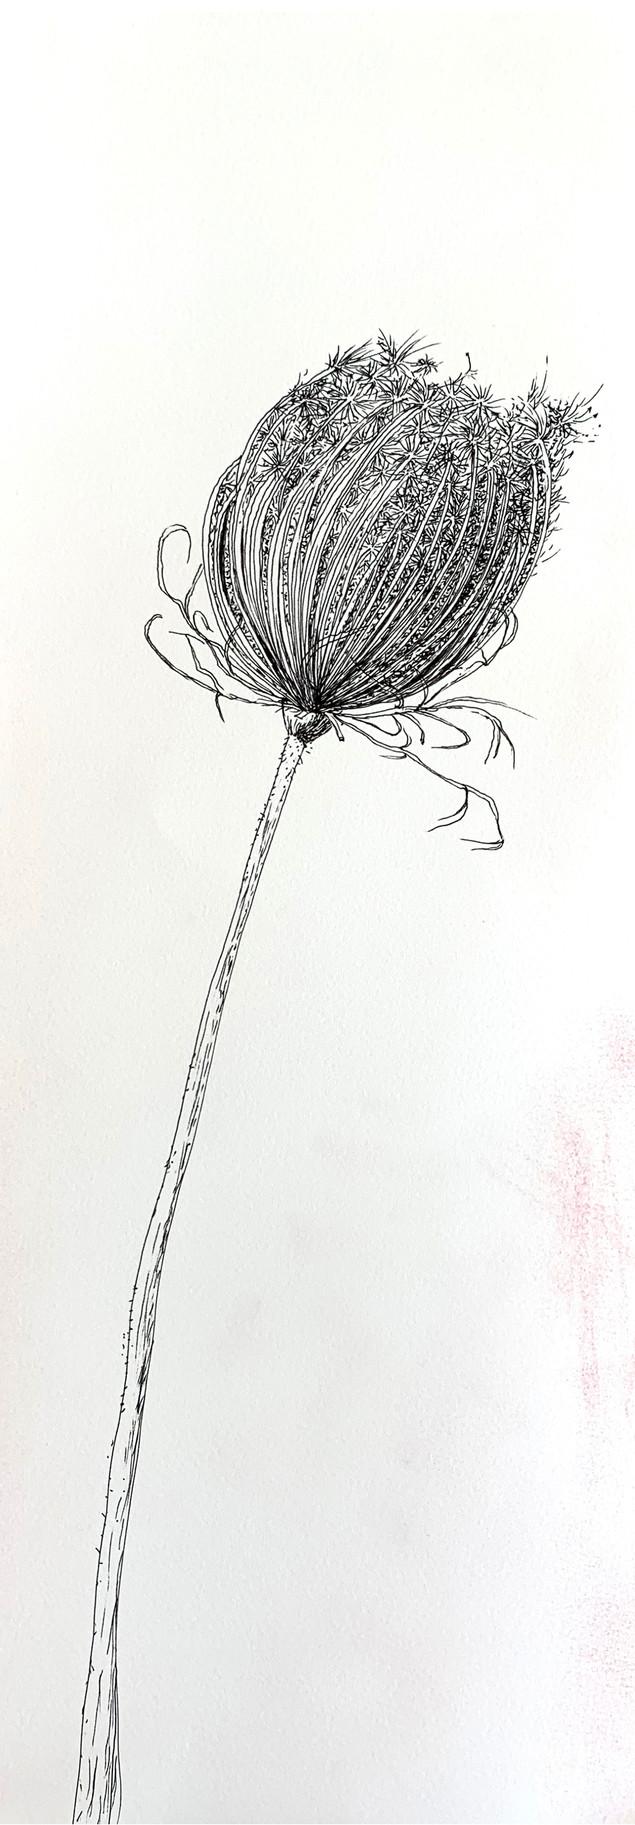 Dry Wild Carrot 3 (Pen on Arche Paper 19X53 cm)